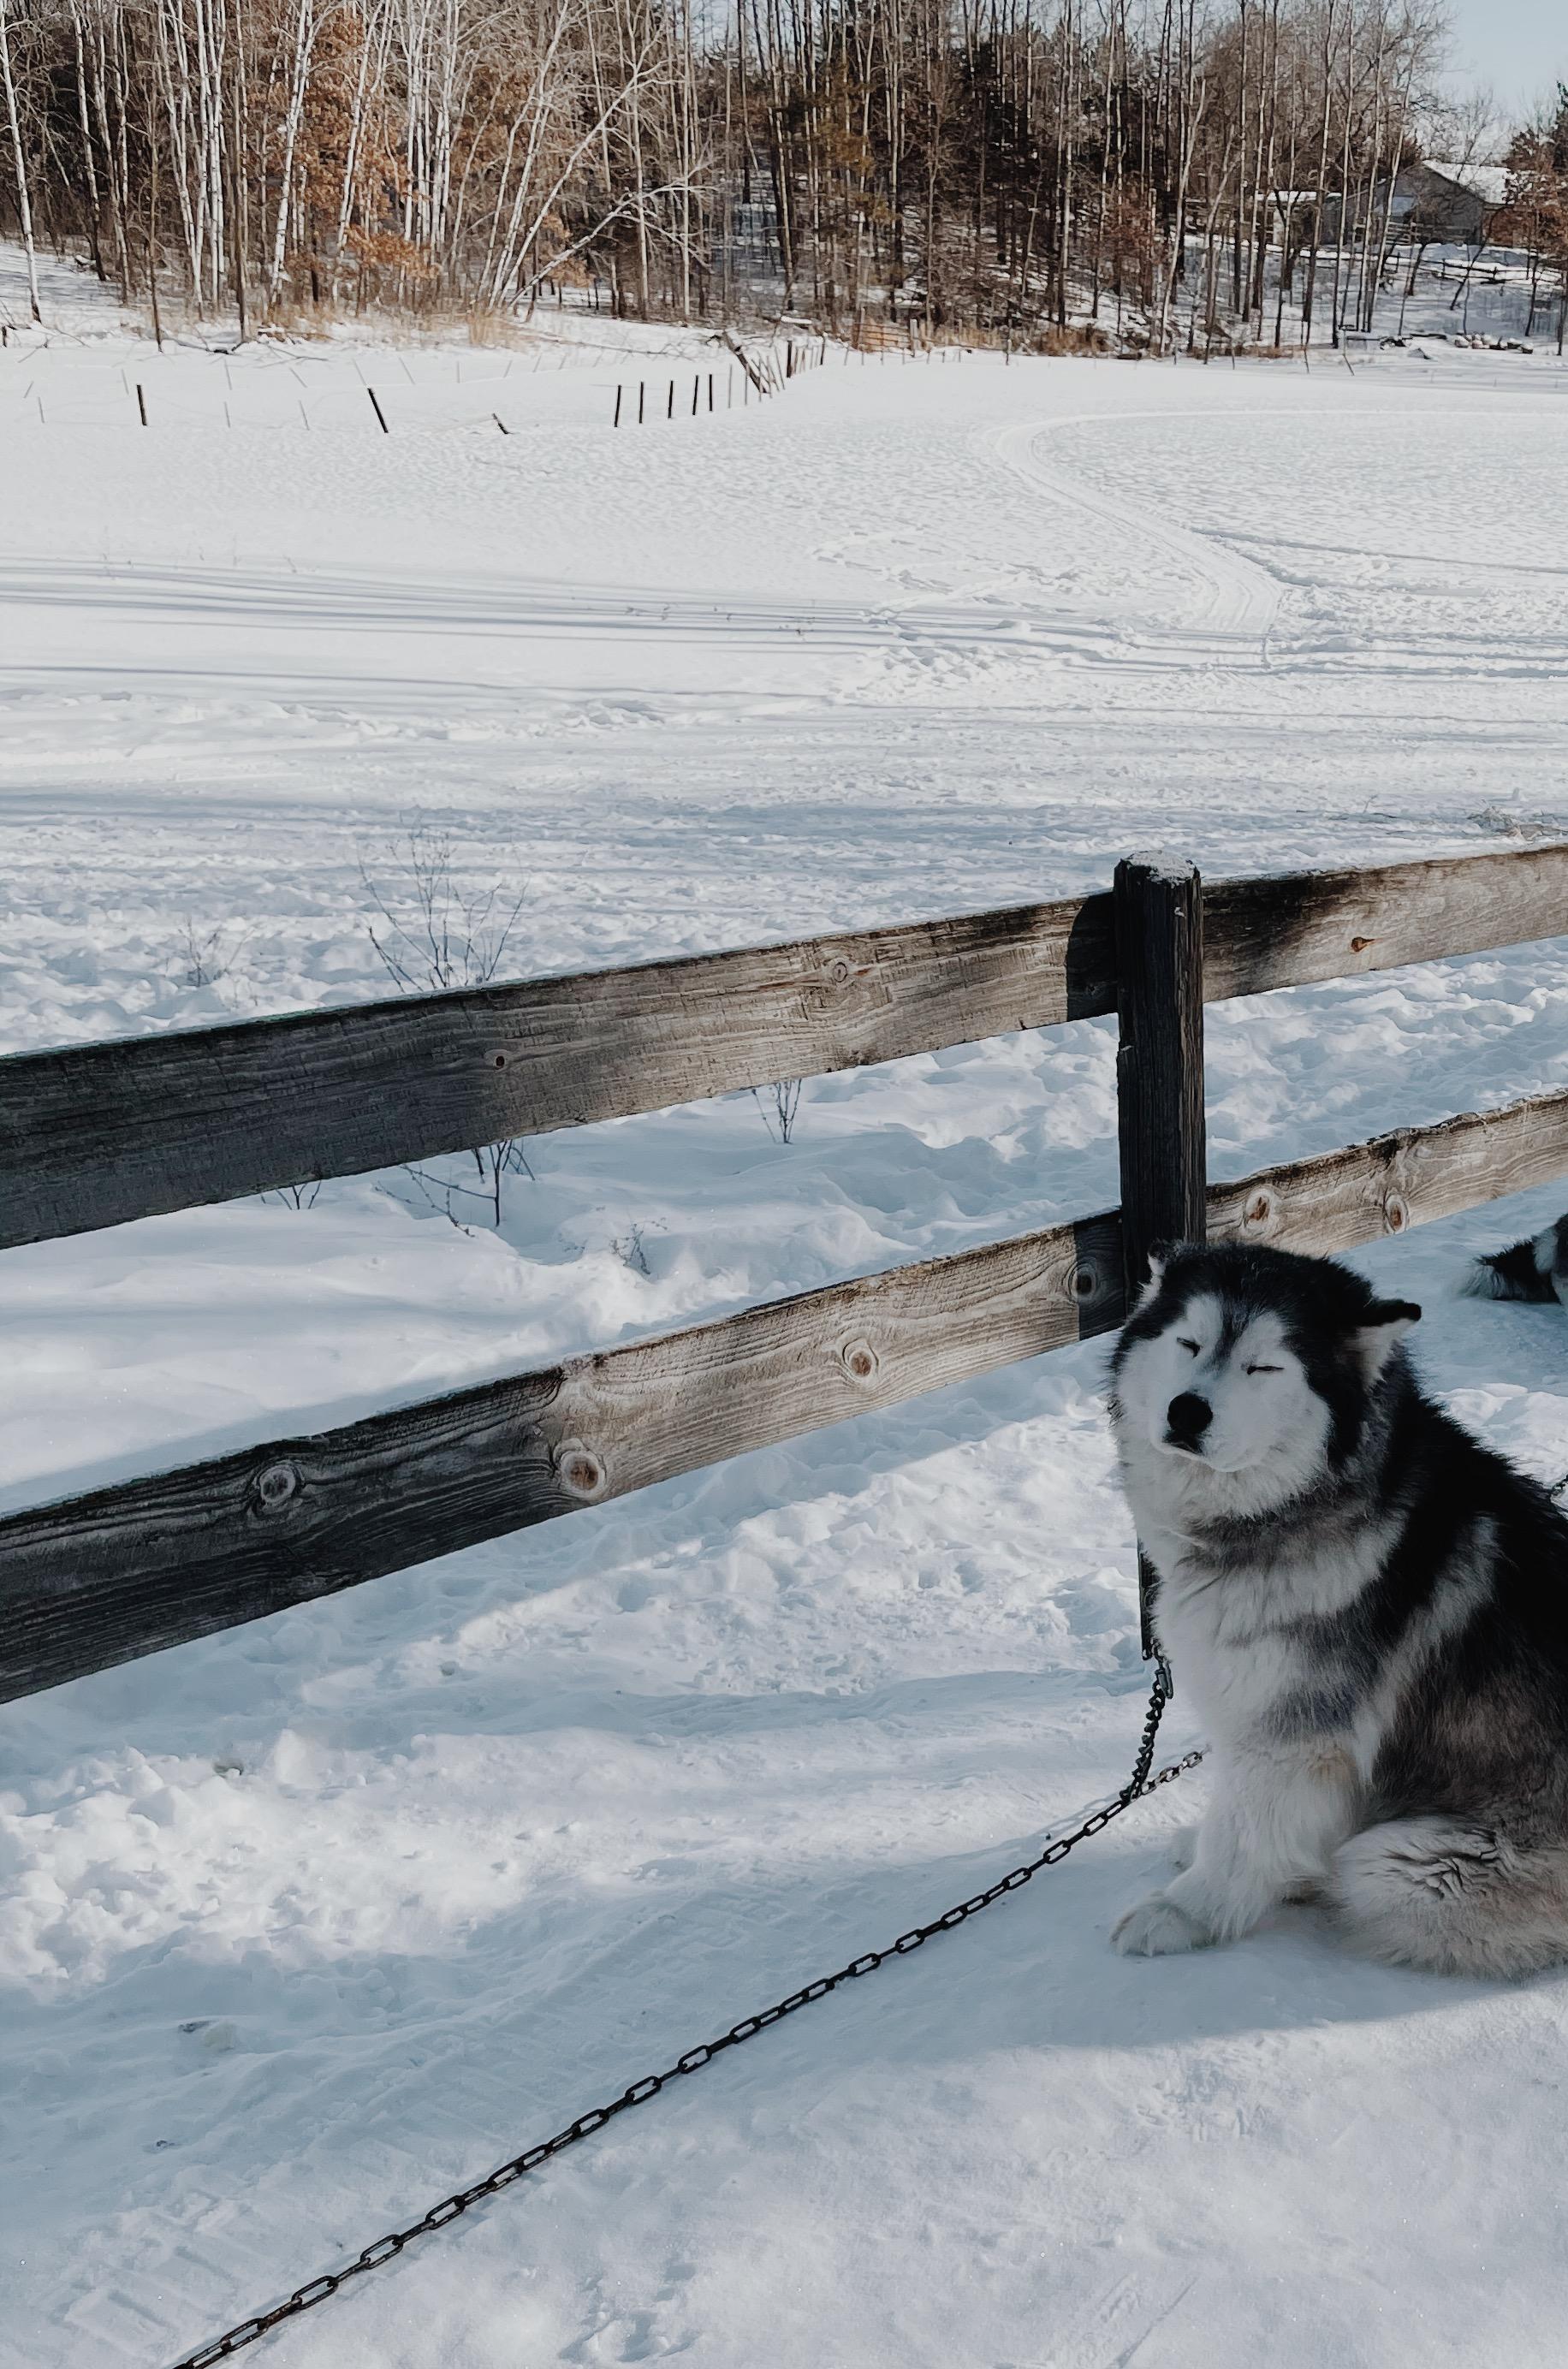 Dog-sledding in Minnesota